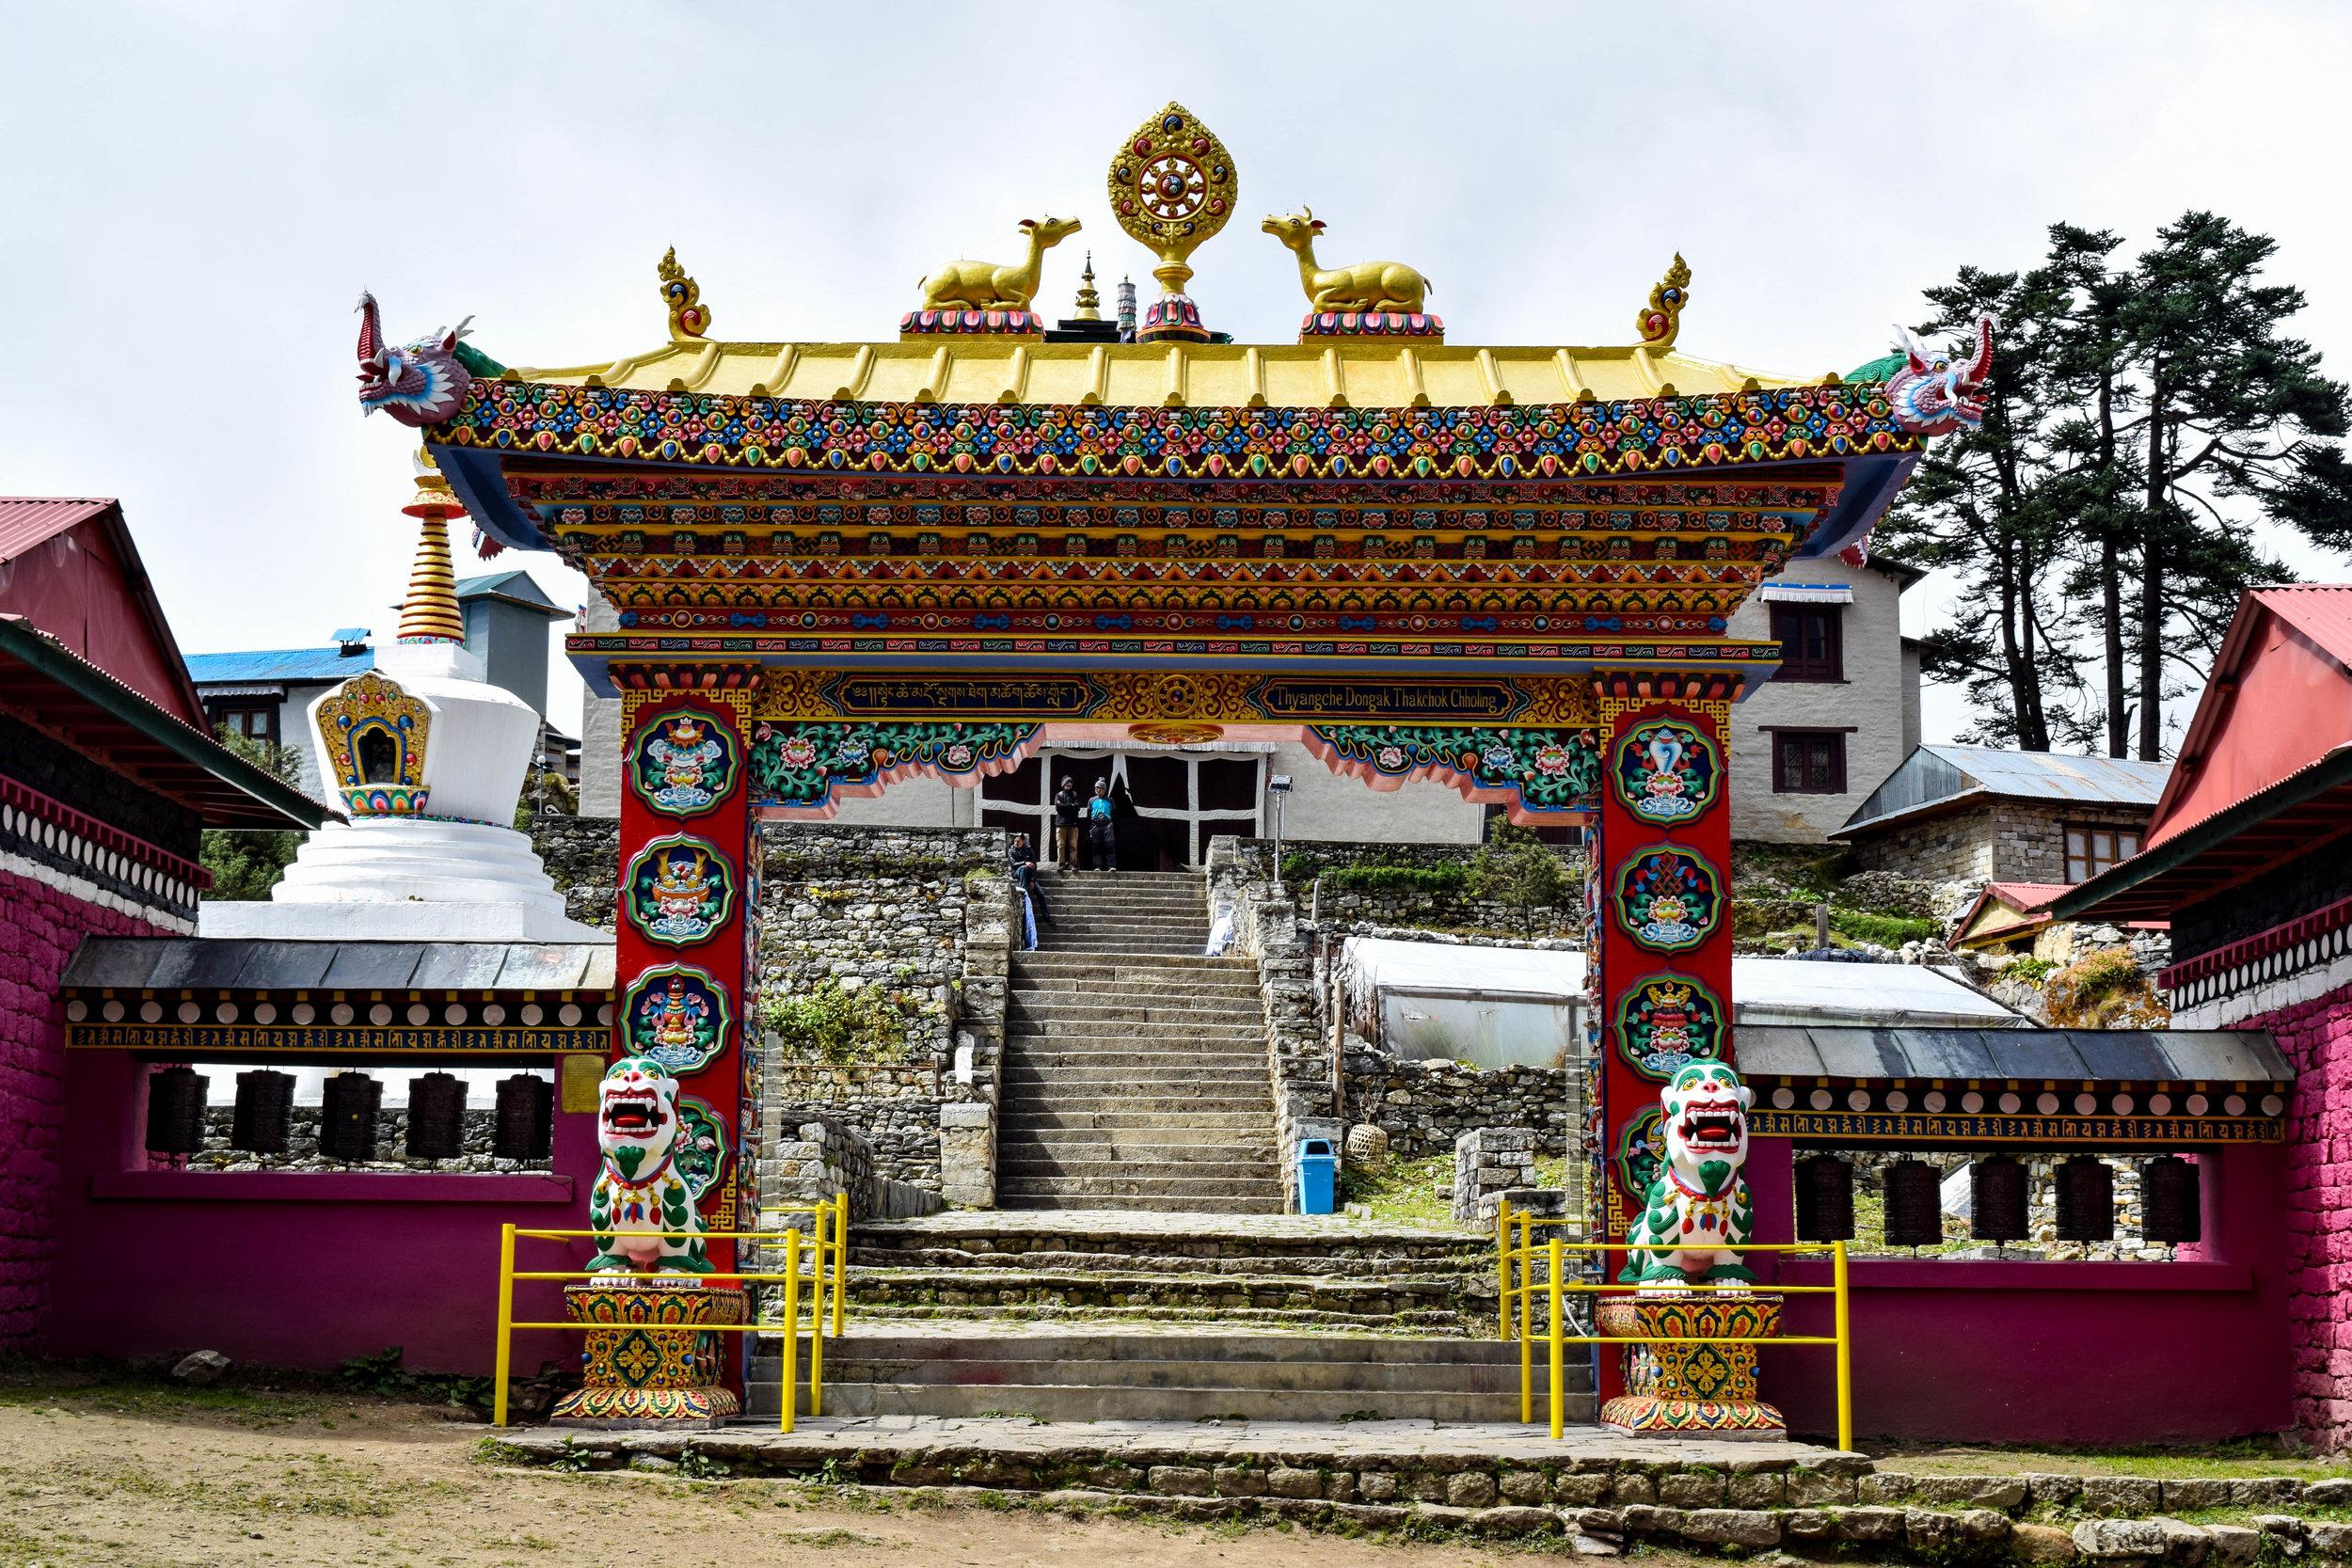 The elaborate gate at Tengboche Monastery.